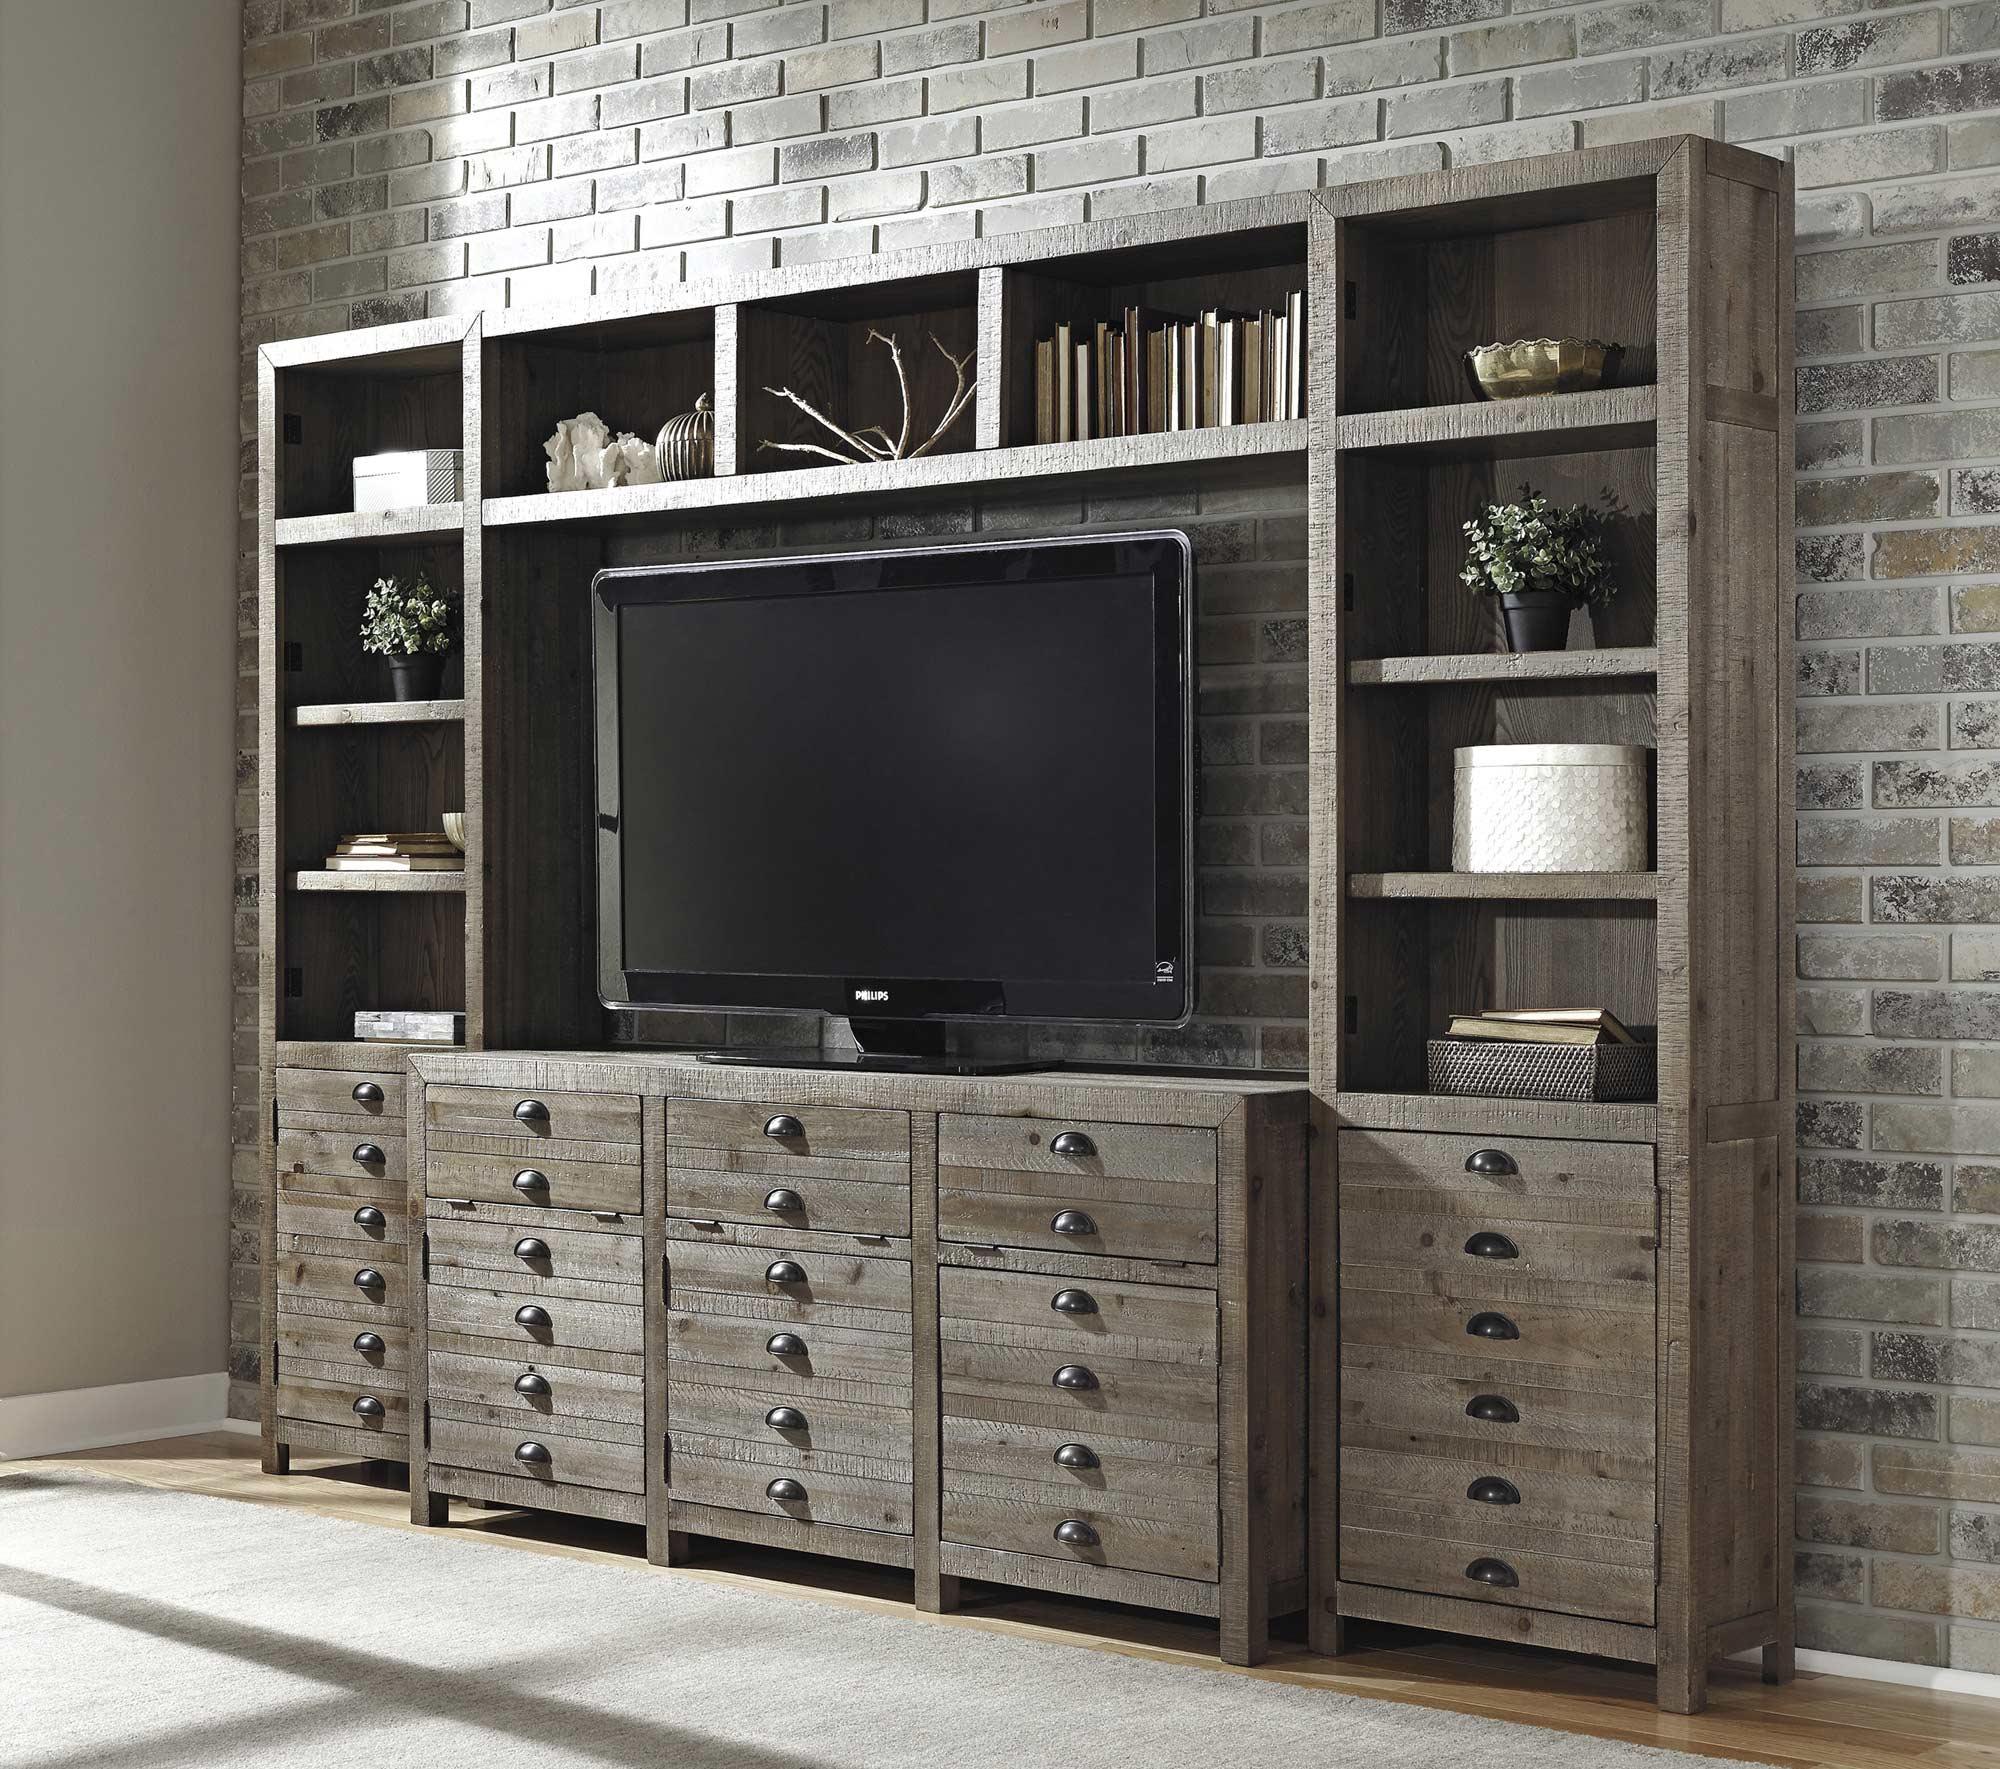 Home Entertainment Furniture Ideas: Keeblen 4-Piece Entertainment Wall